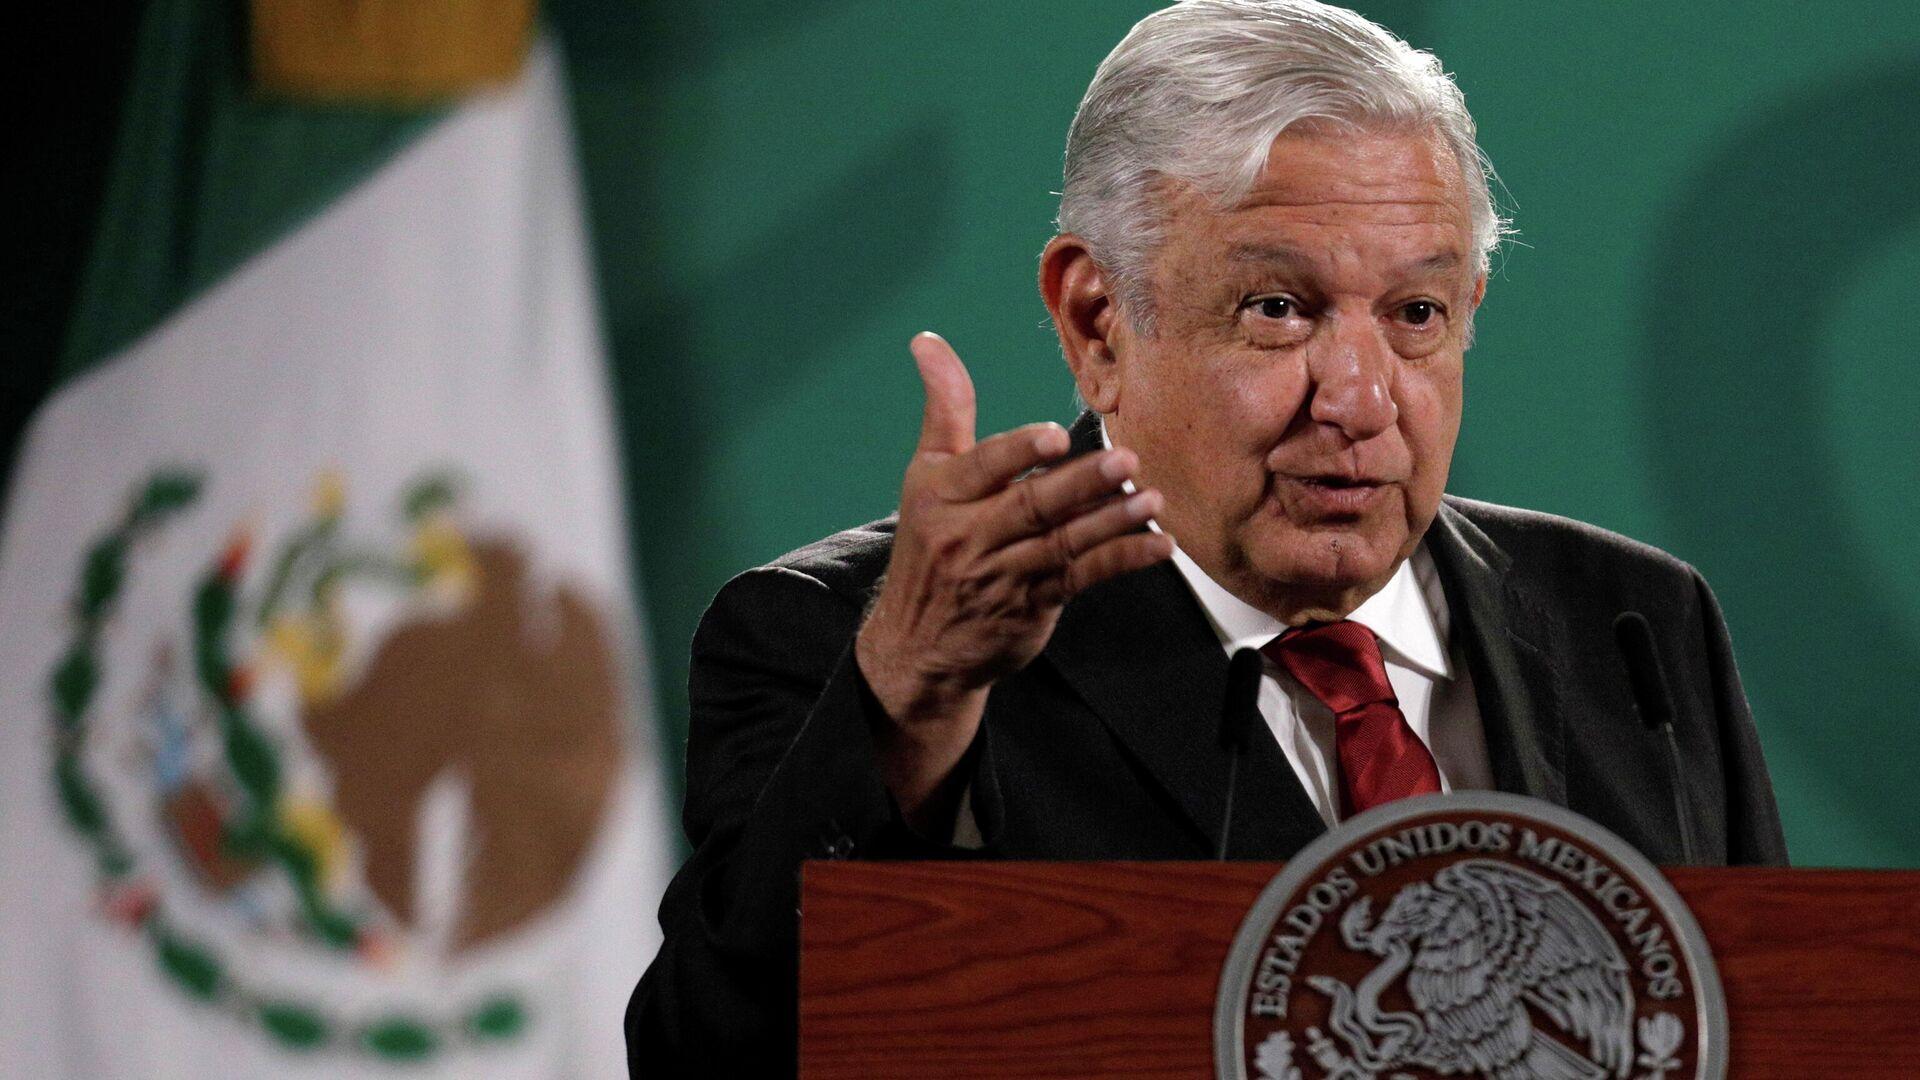 El presidente de México, Andrés Manuel López Obrador - Sputnik Mundo, 1920, 15.06.2021